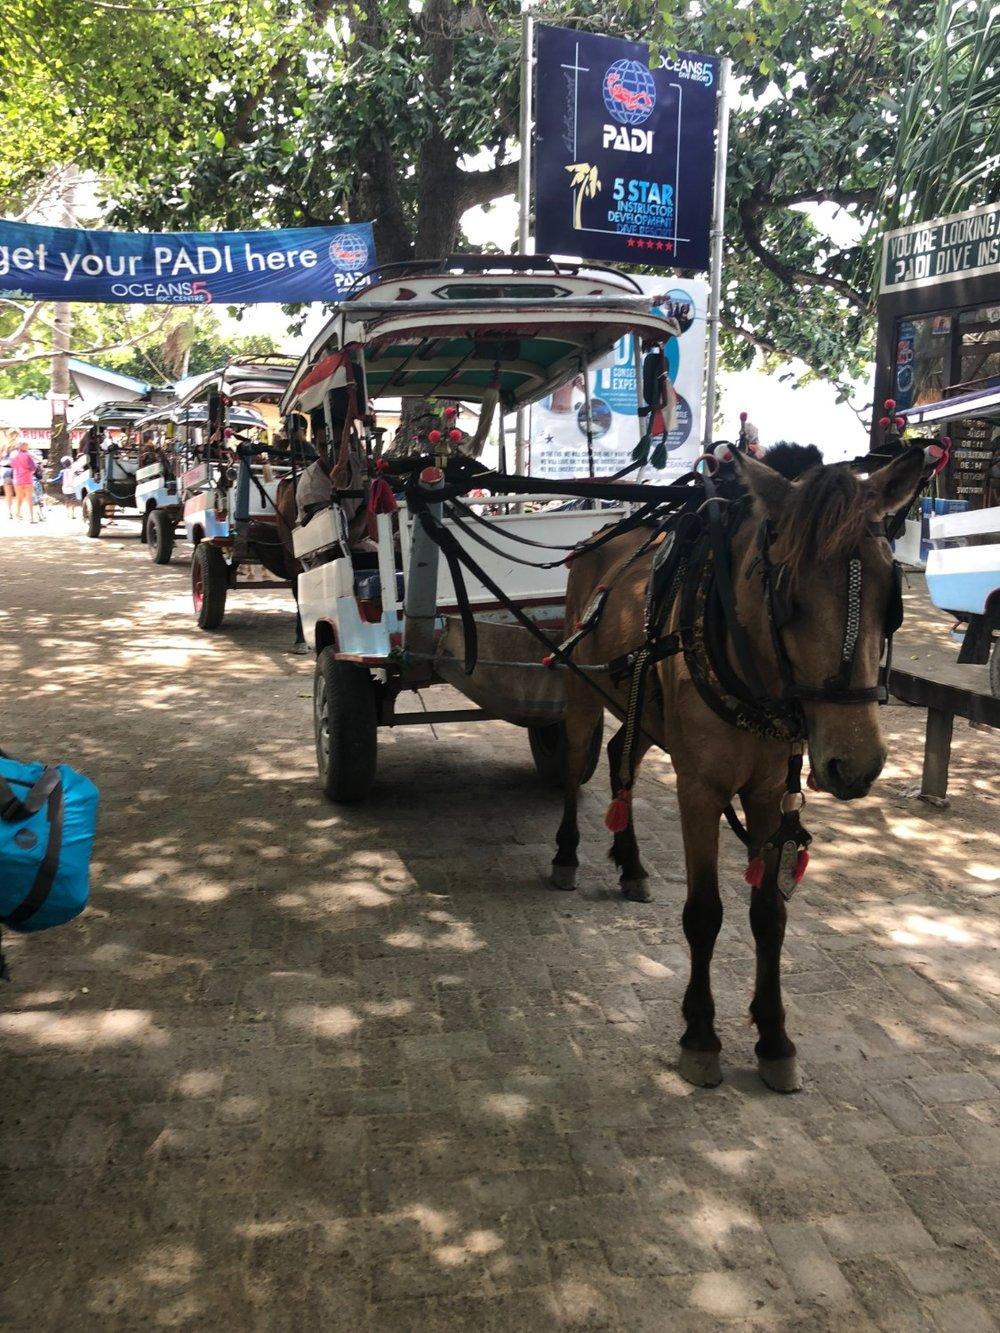 Horse drawn 'taaxi's' on Gili Air, Indonesia. boldlygotravel.com